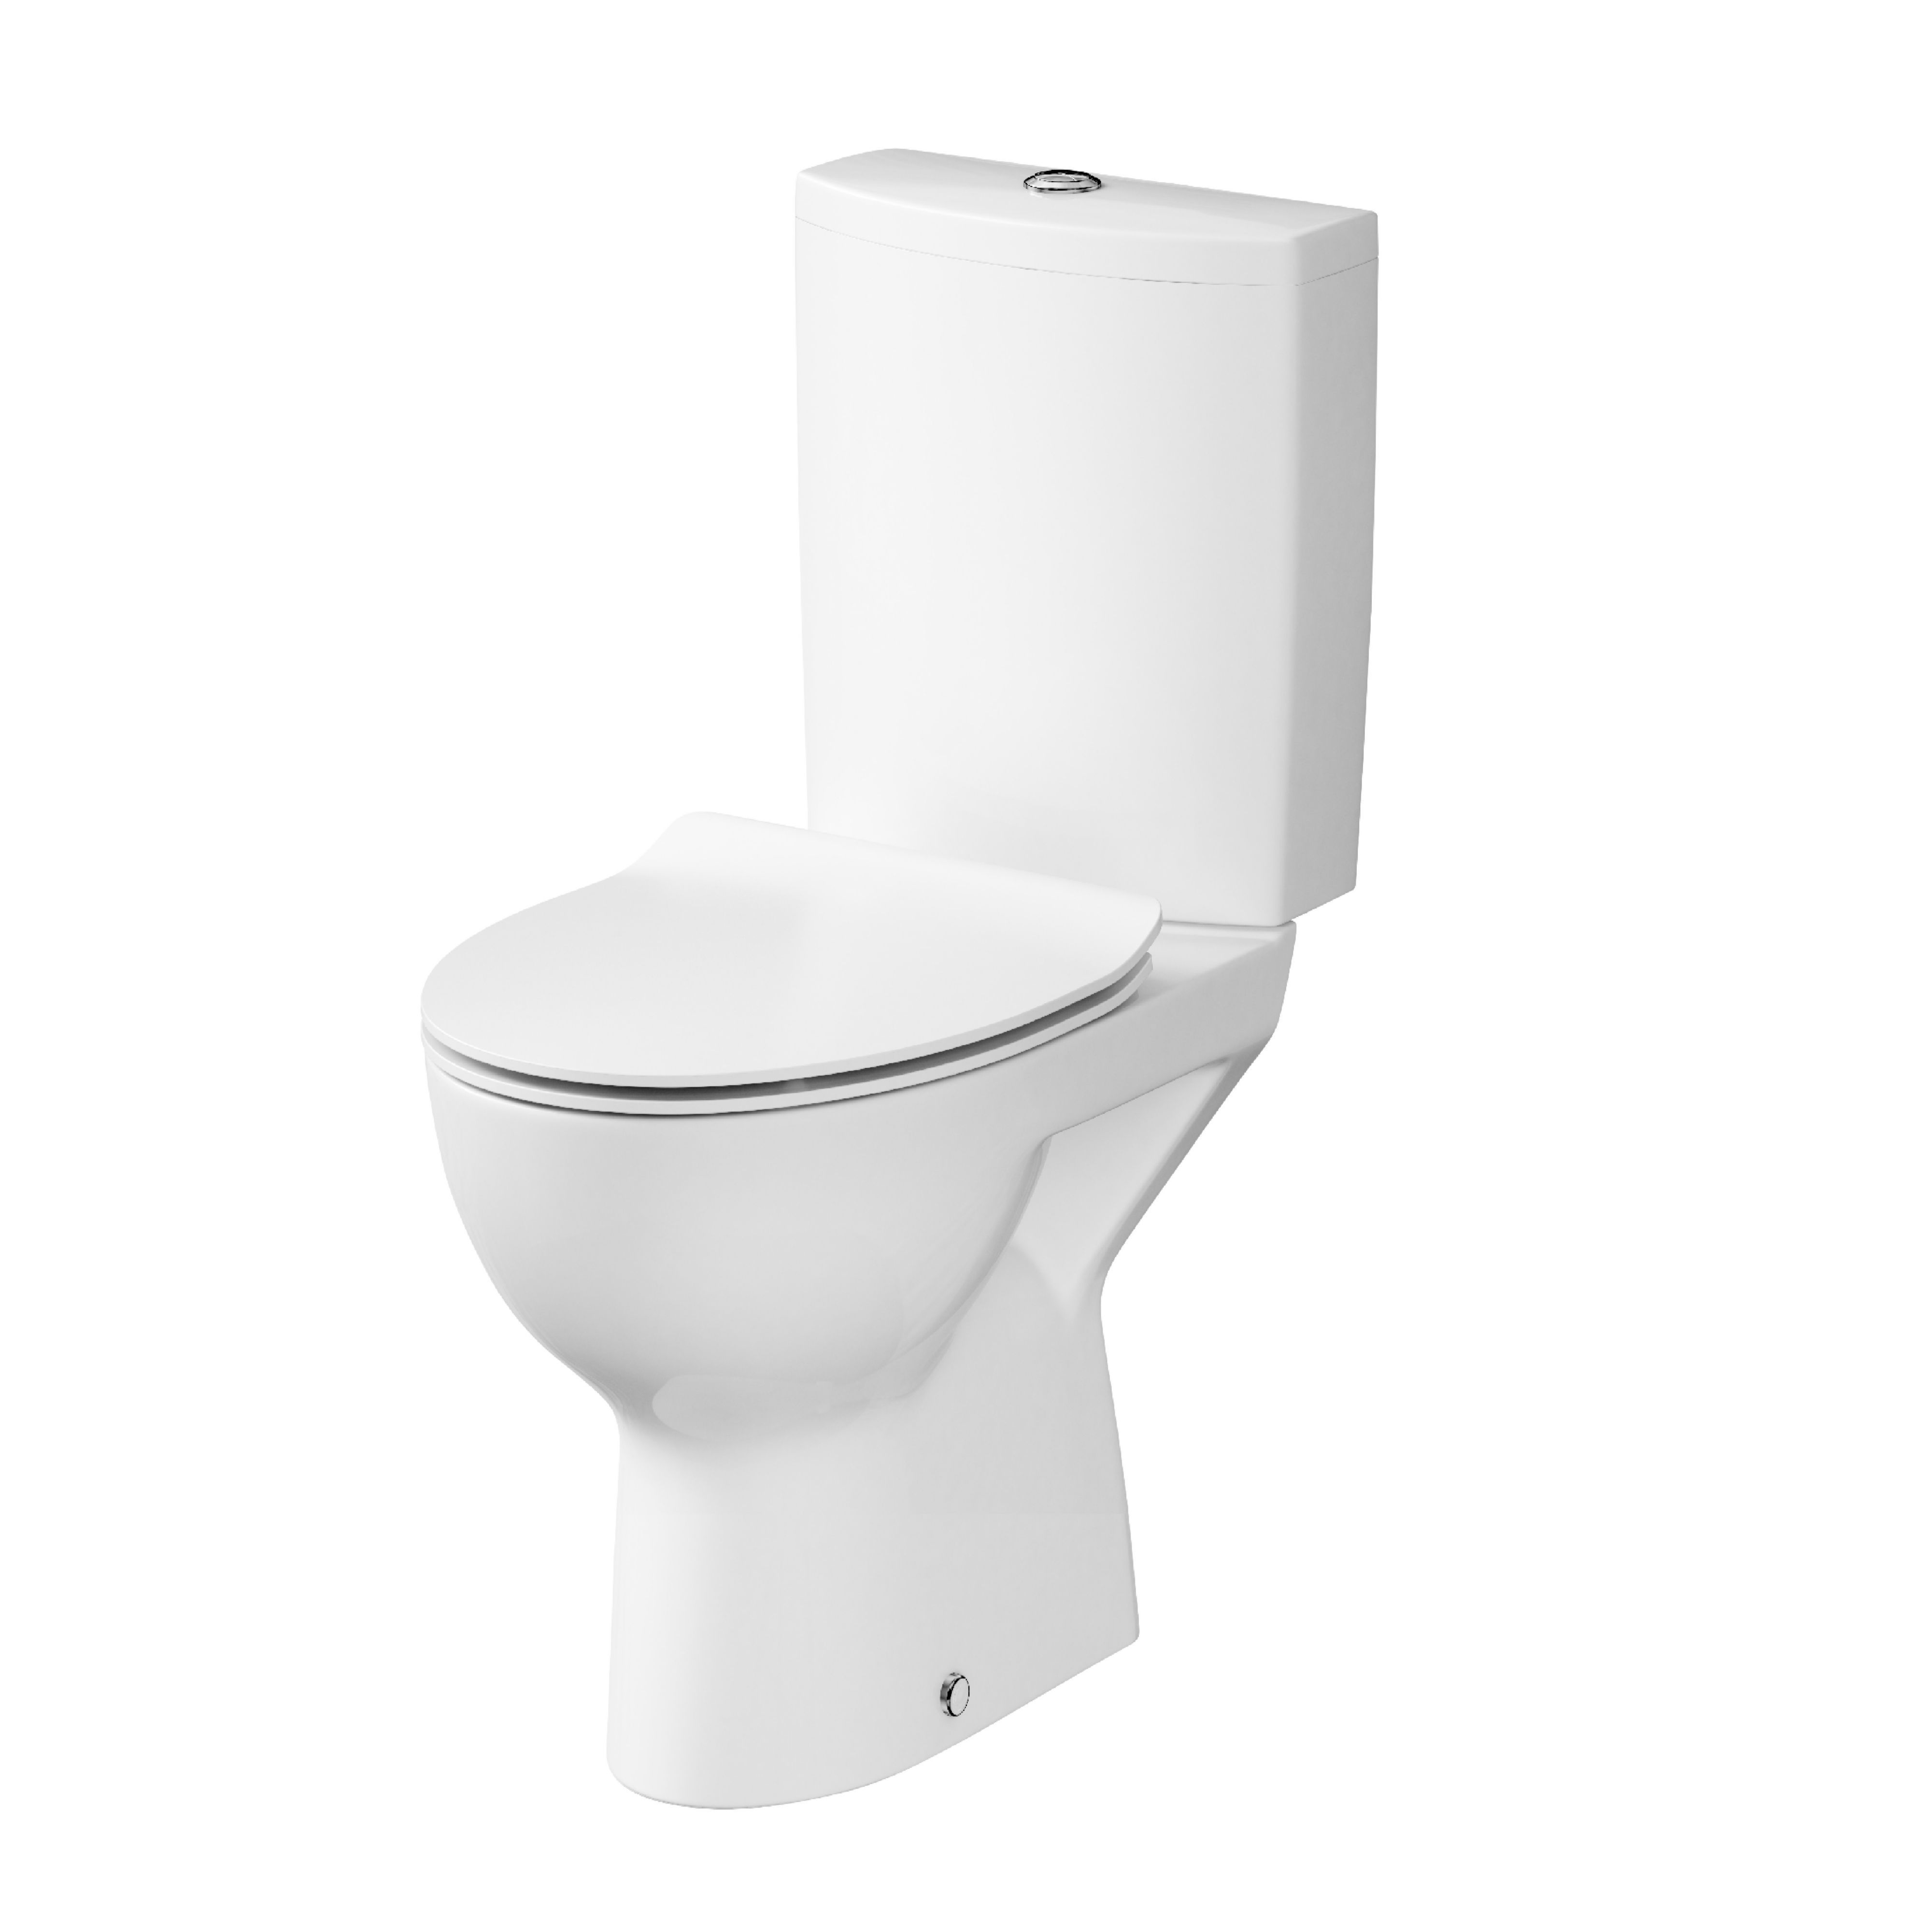 Surprising Cersanit Solare Rimless Close Coupled Toilet With Soft Close Machost Co Dining Chair Design Ideas Machostcouk